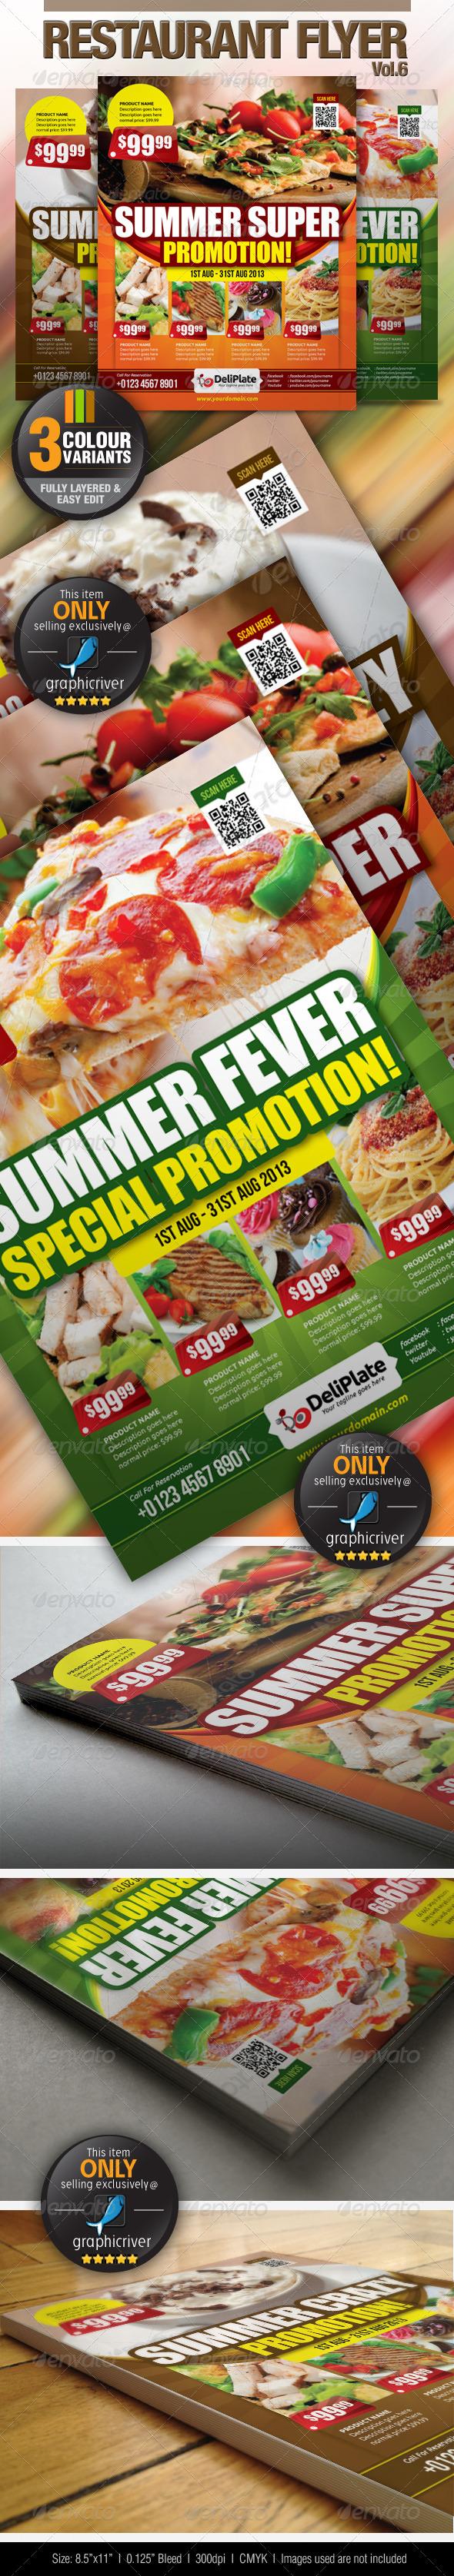 GraphicRiver Restaurant Flyer Vol.6 4827068